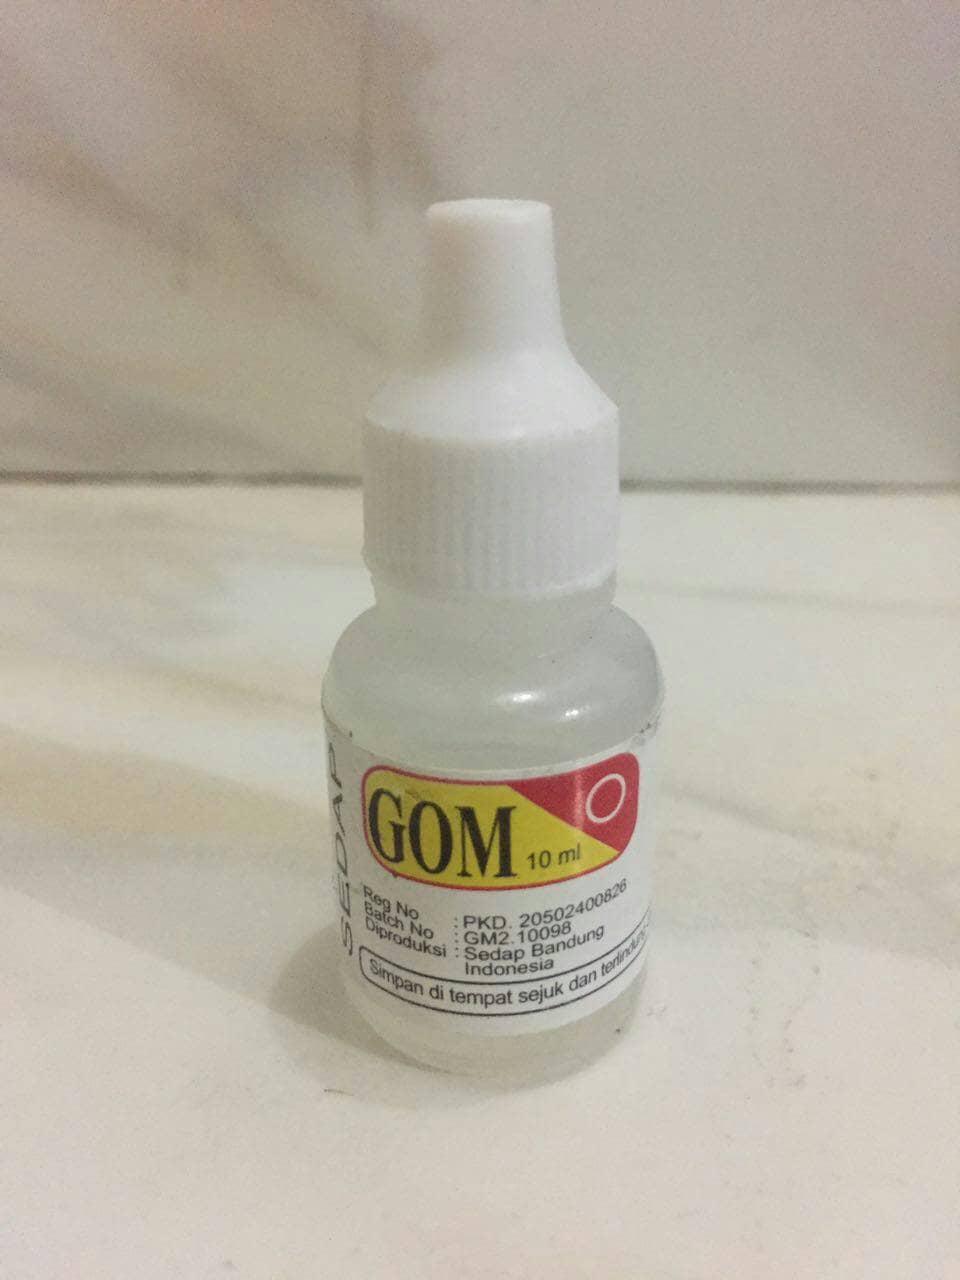 Jual Gom Gliserin Glycerin 10ml Mandirisupplierhoreka 8ml Tokopedia